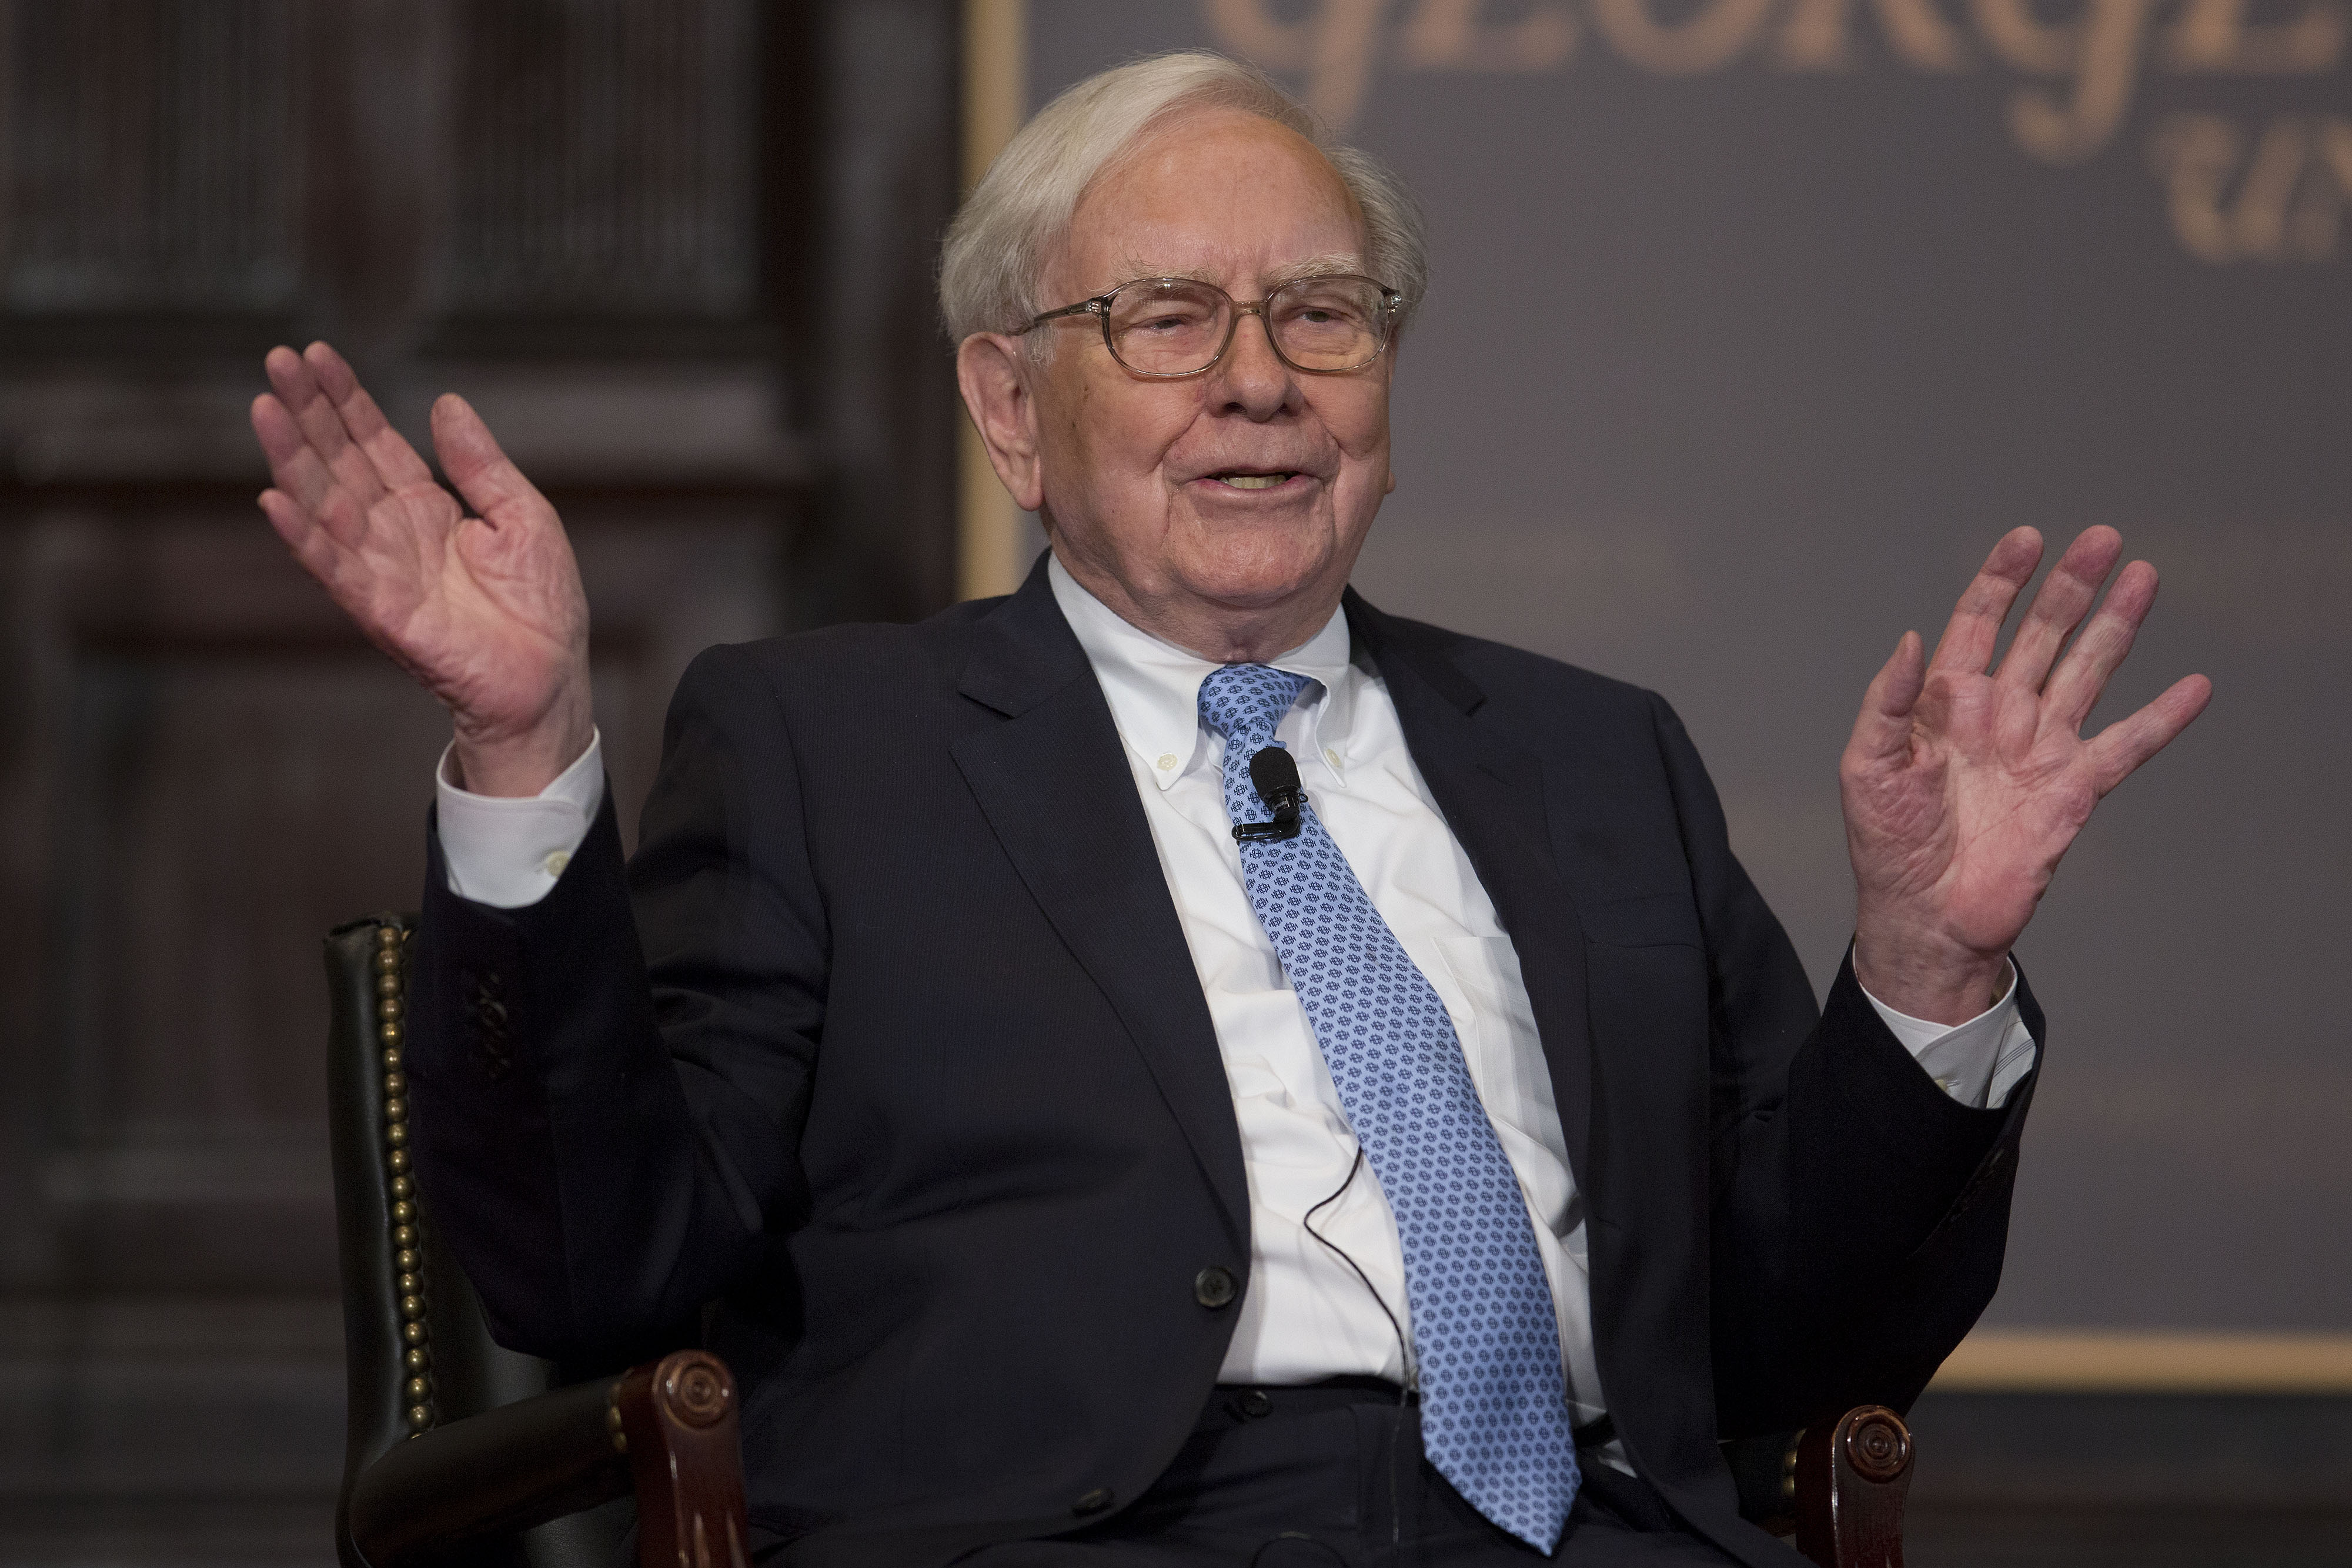 Warren Buffett's 4 Best Performing Stocks of 2016 So Far